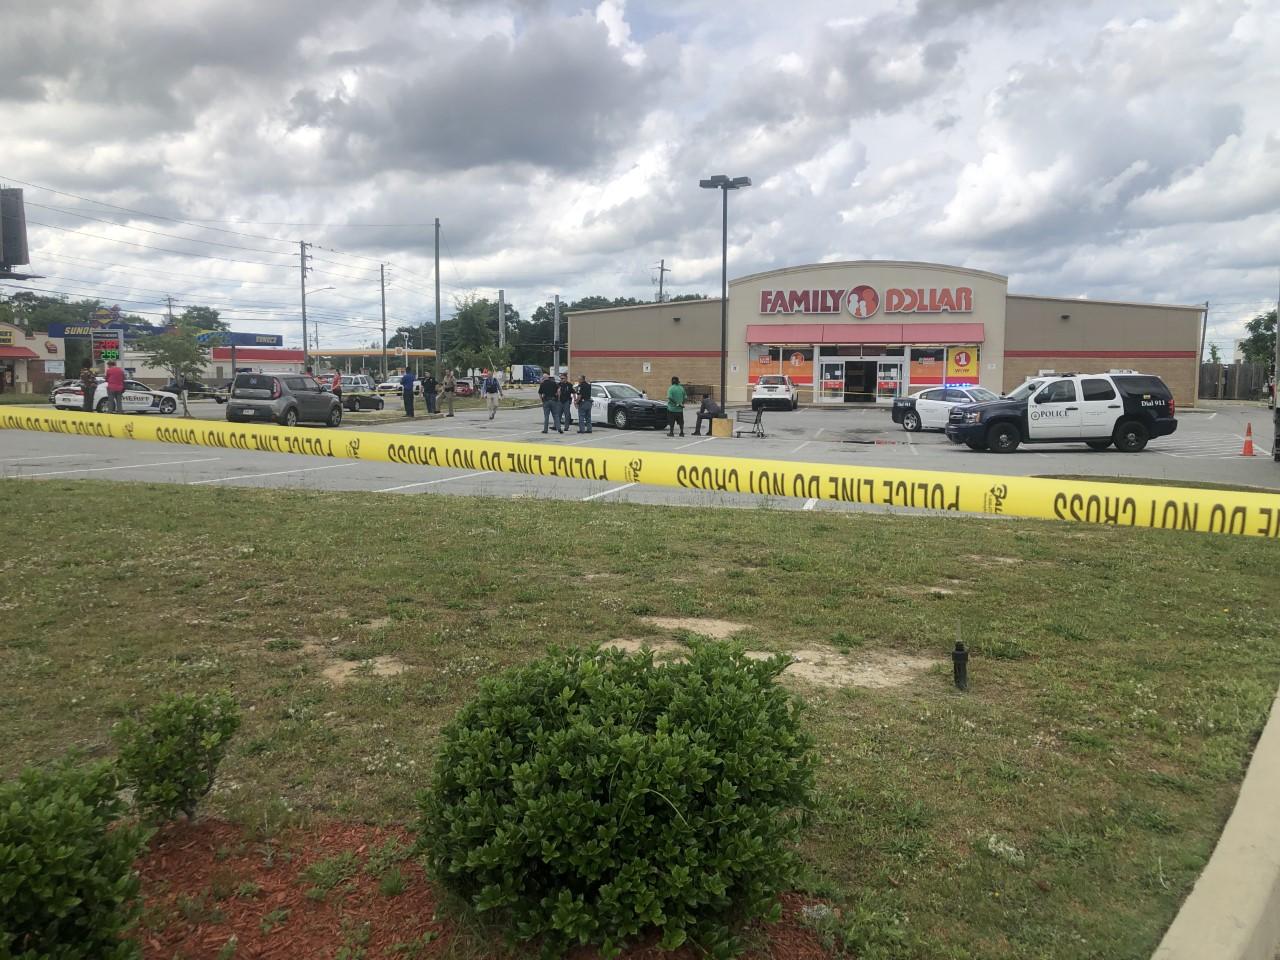 Columbus, Ga. police at Family Dollar on Floyd Road